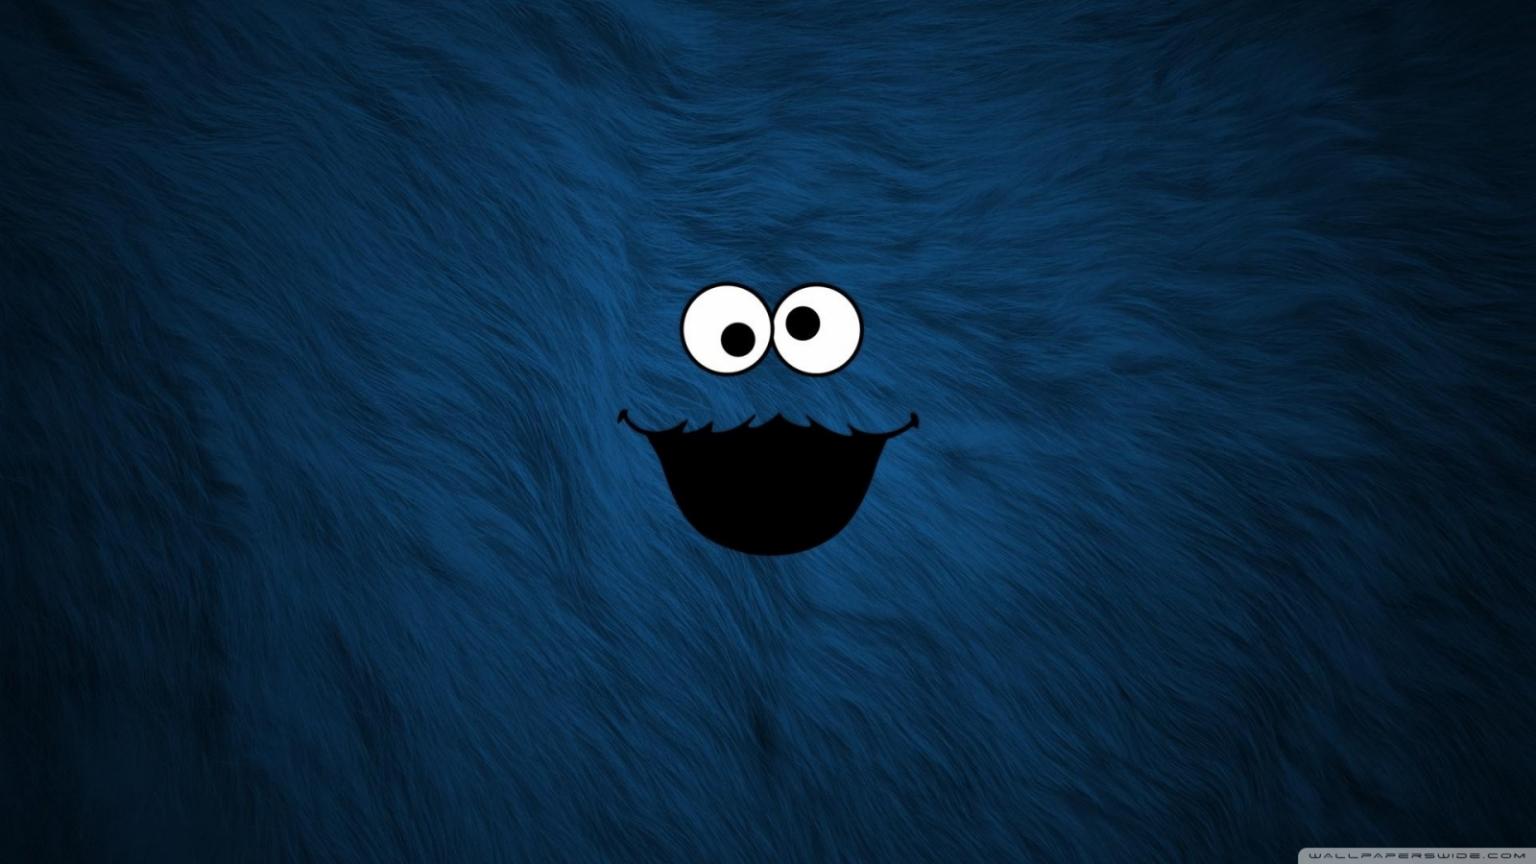 Free Download Cookie Monster Background 4k Hd Desktop Wallpaper